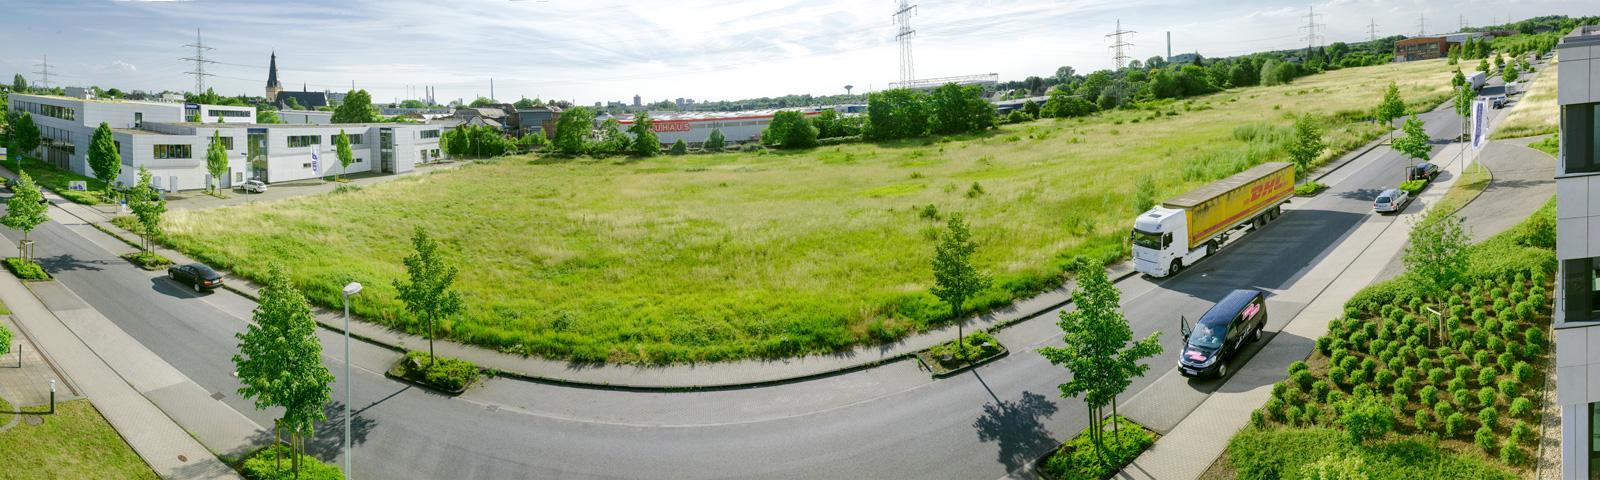 Innovationspark Leverkusen Panorama